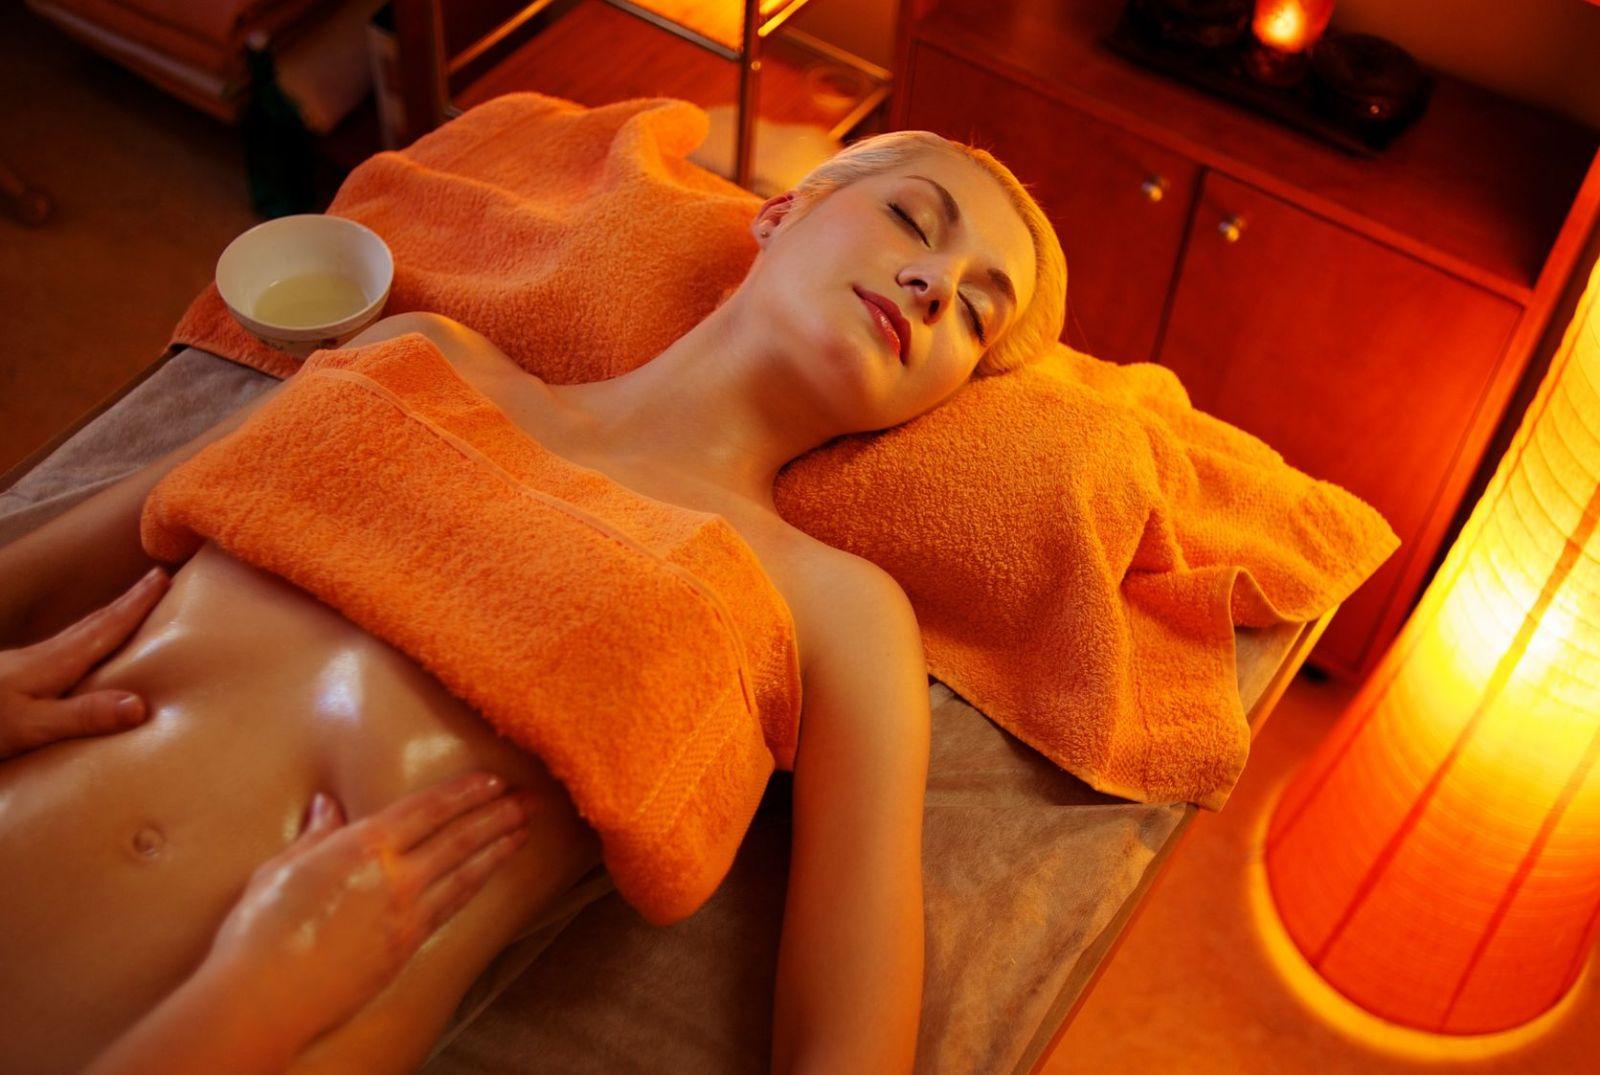 Эротический массаж в магнитогорске на дому фото 232-739